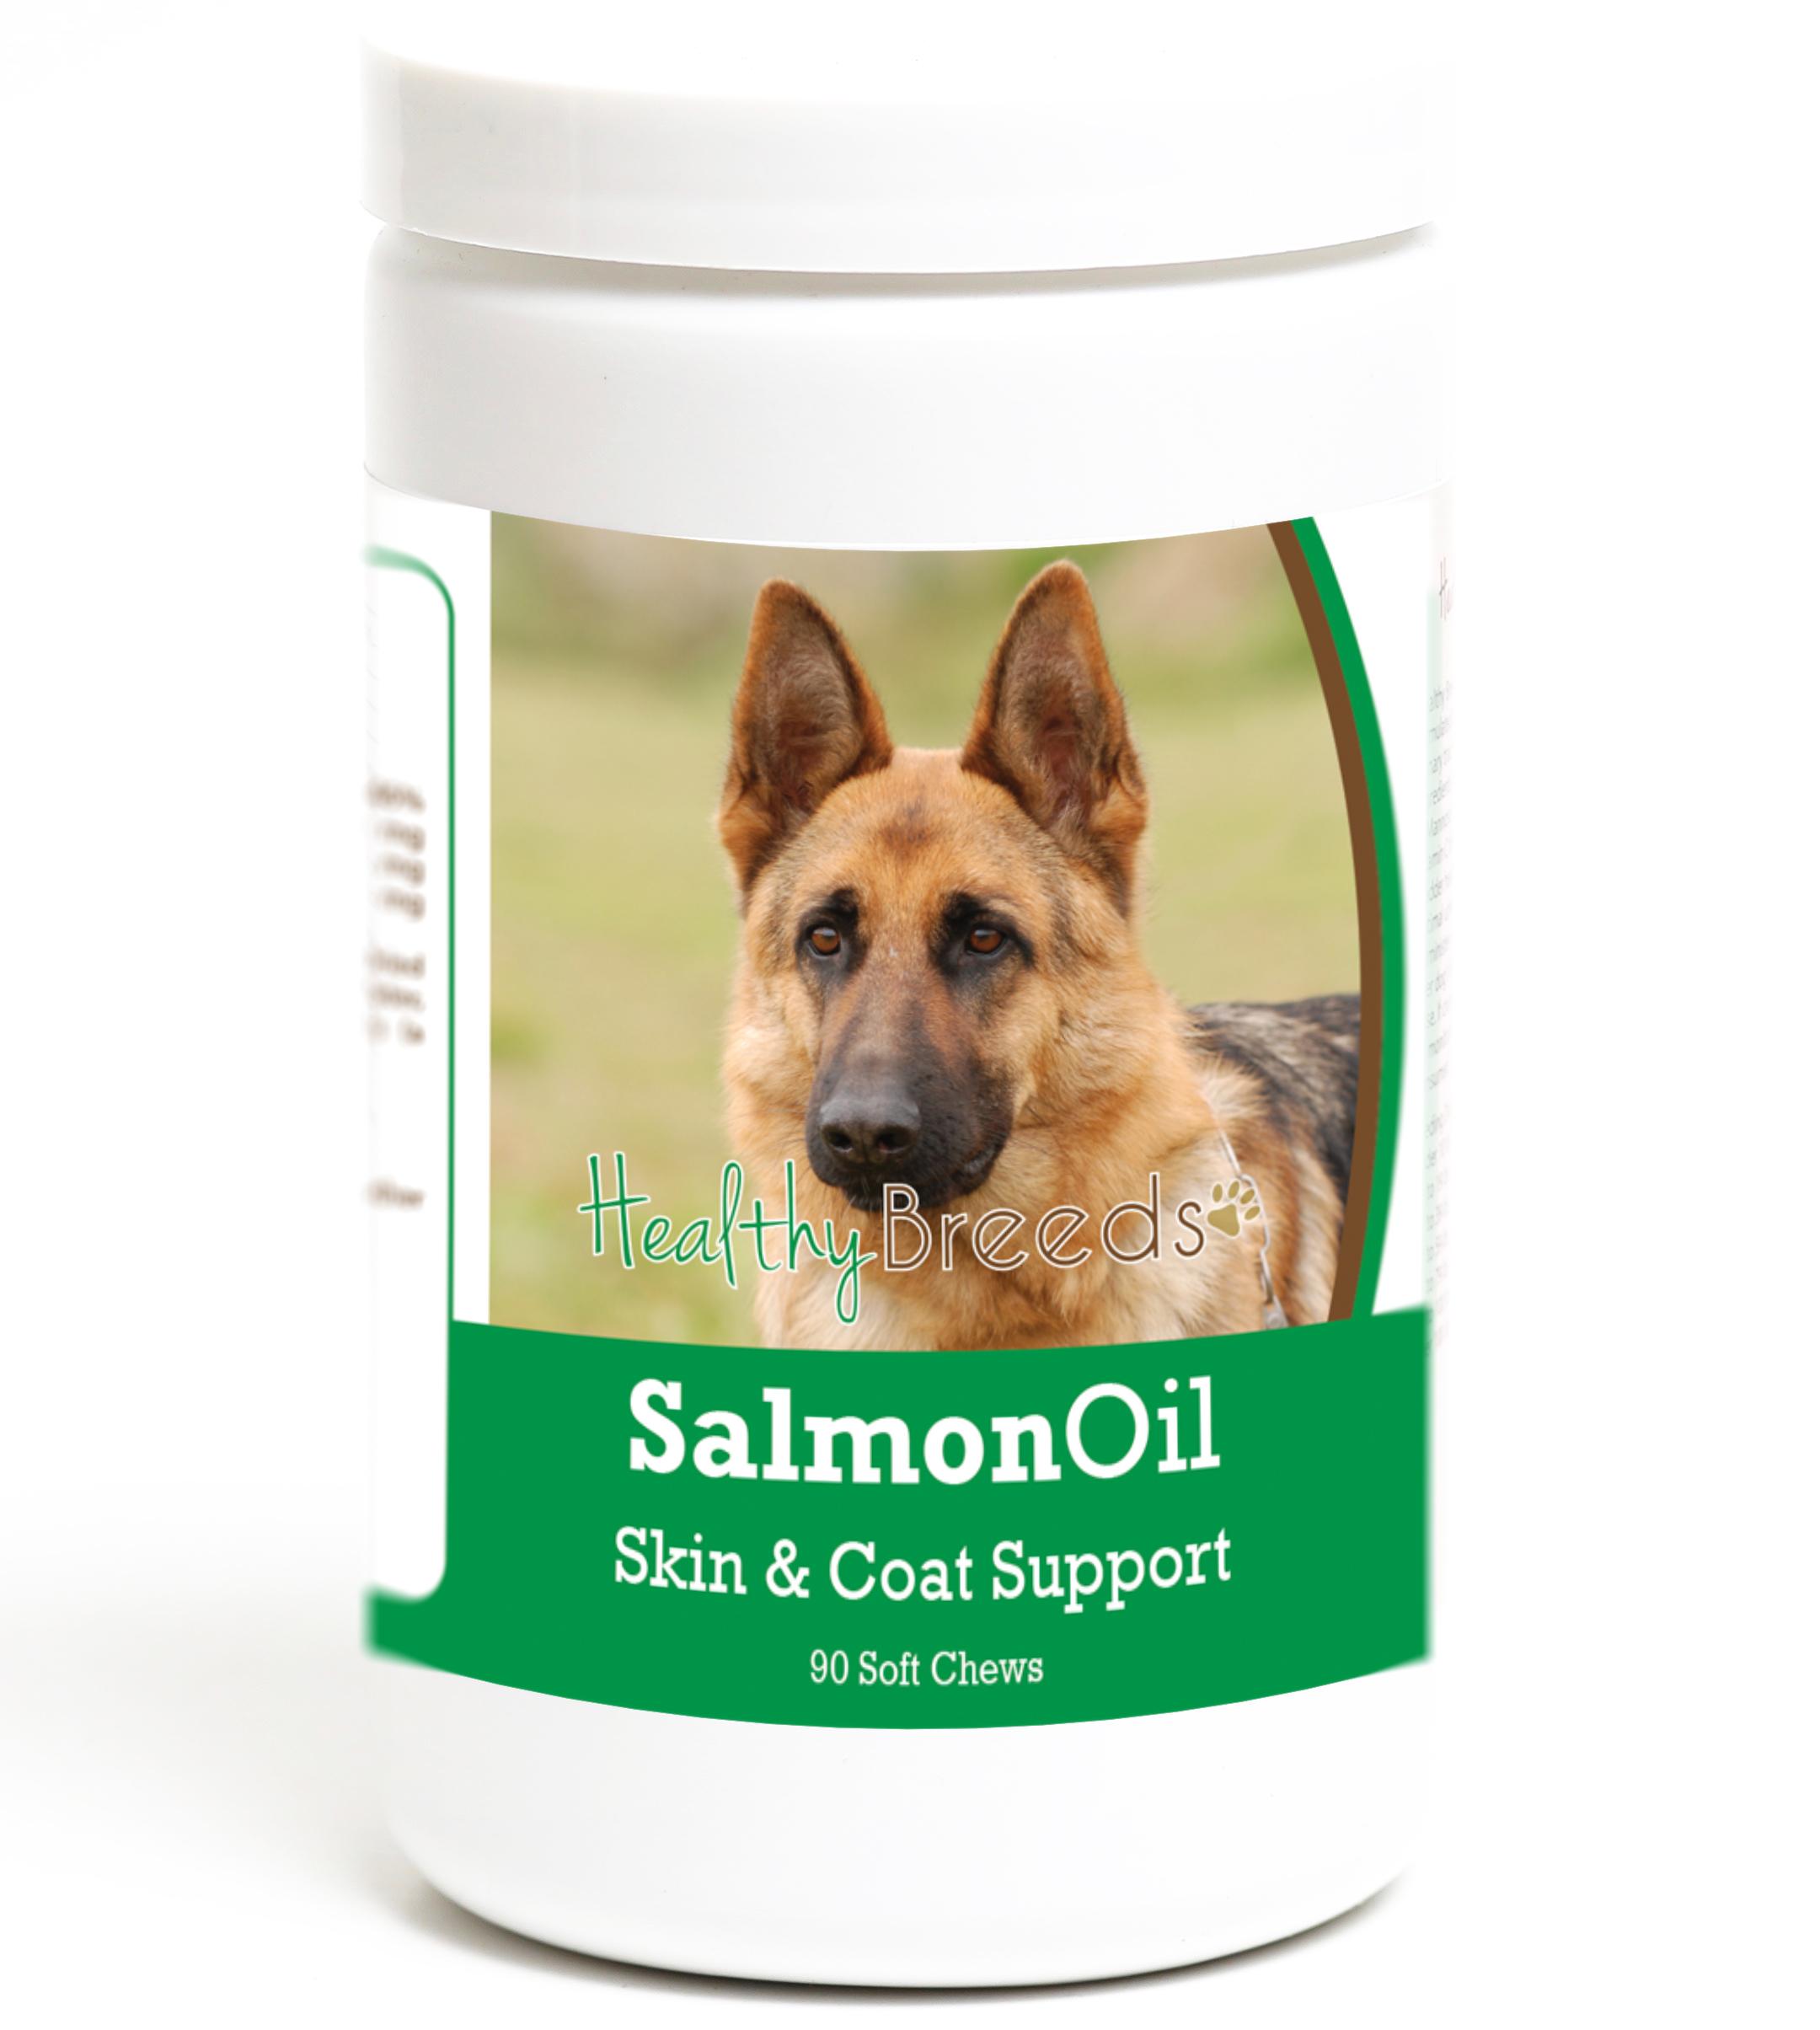 Healthy Breeds German Shepherd Salmon Oil Soft Chews 90 Count